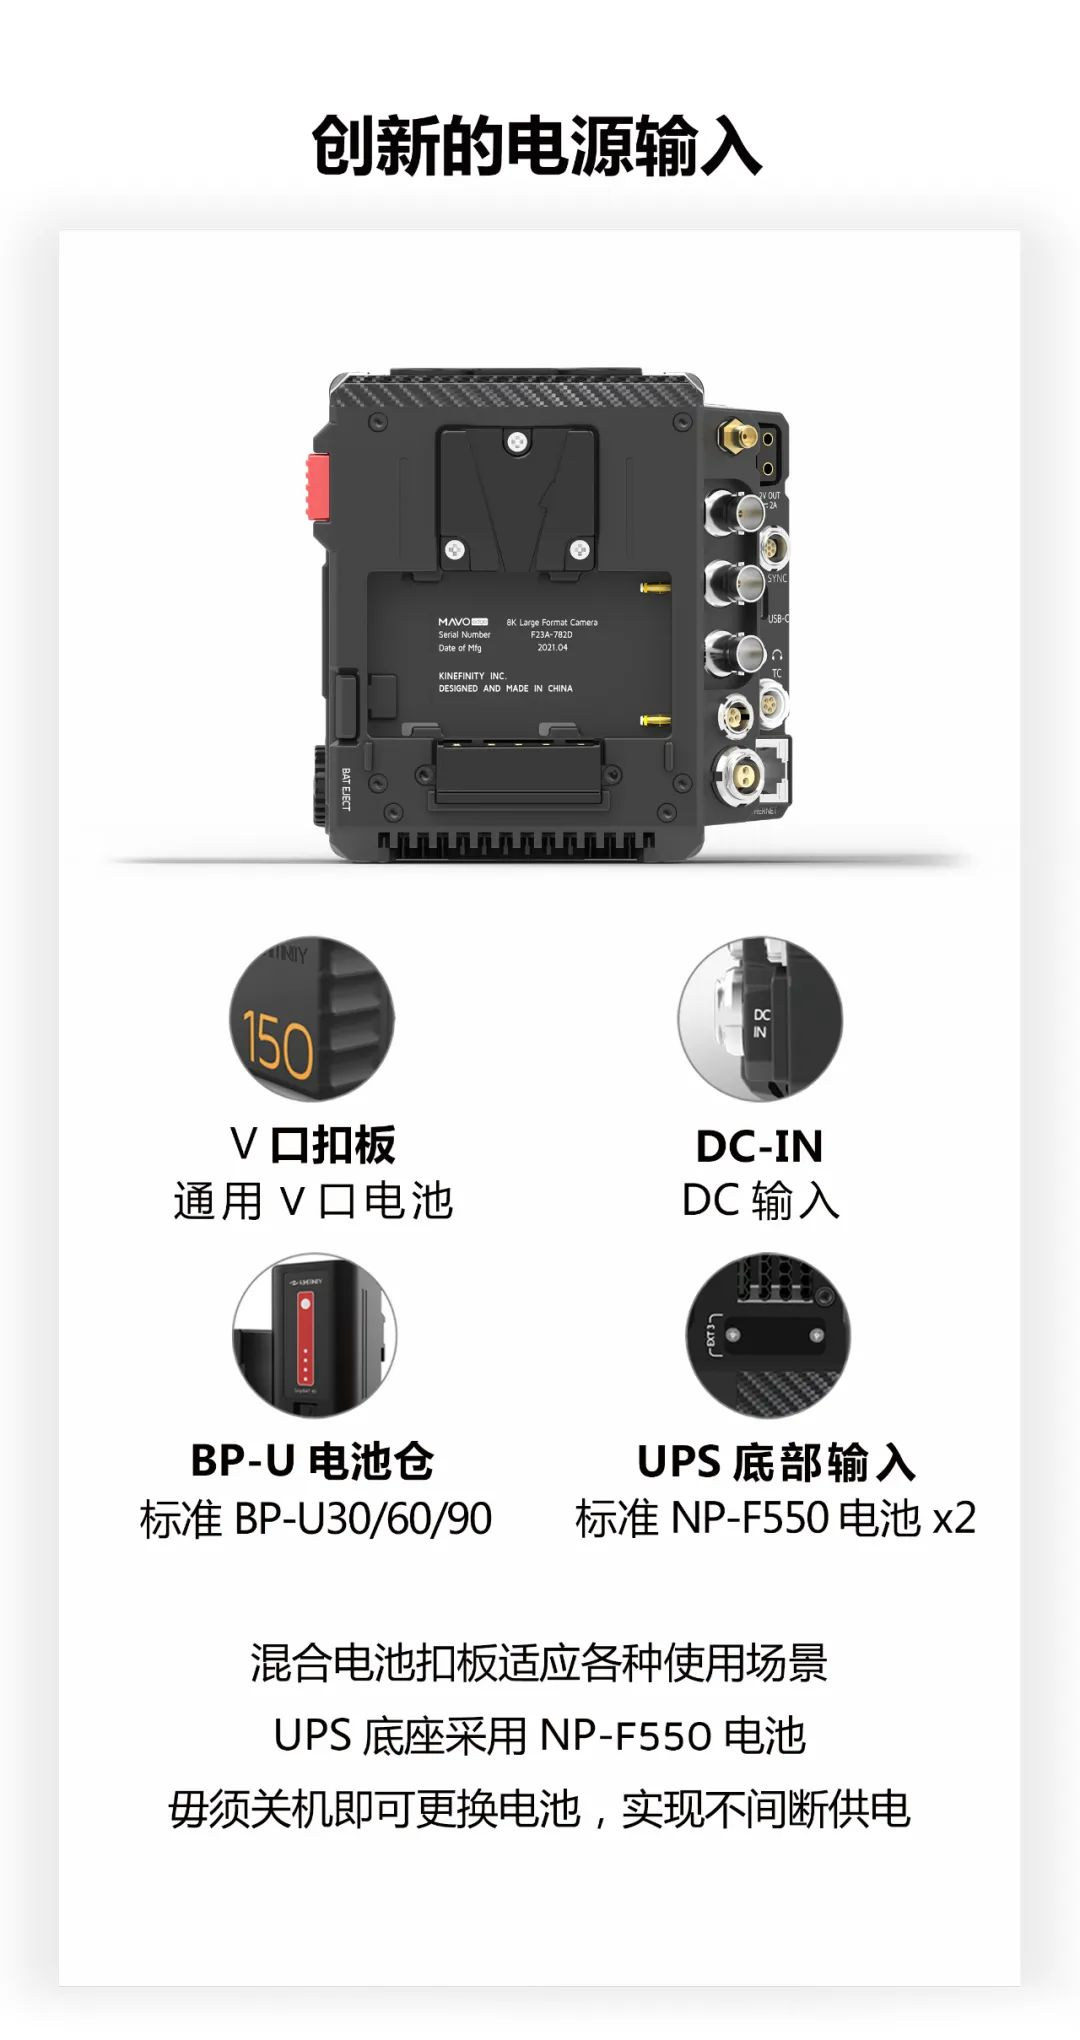 MAVO Edge 8K 正式发售! 8K摄影机 第6张